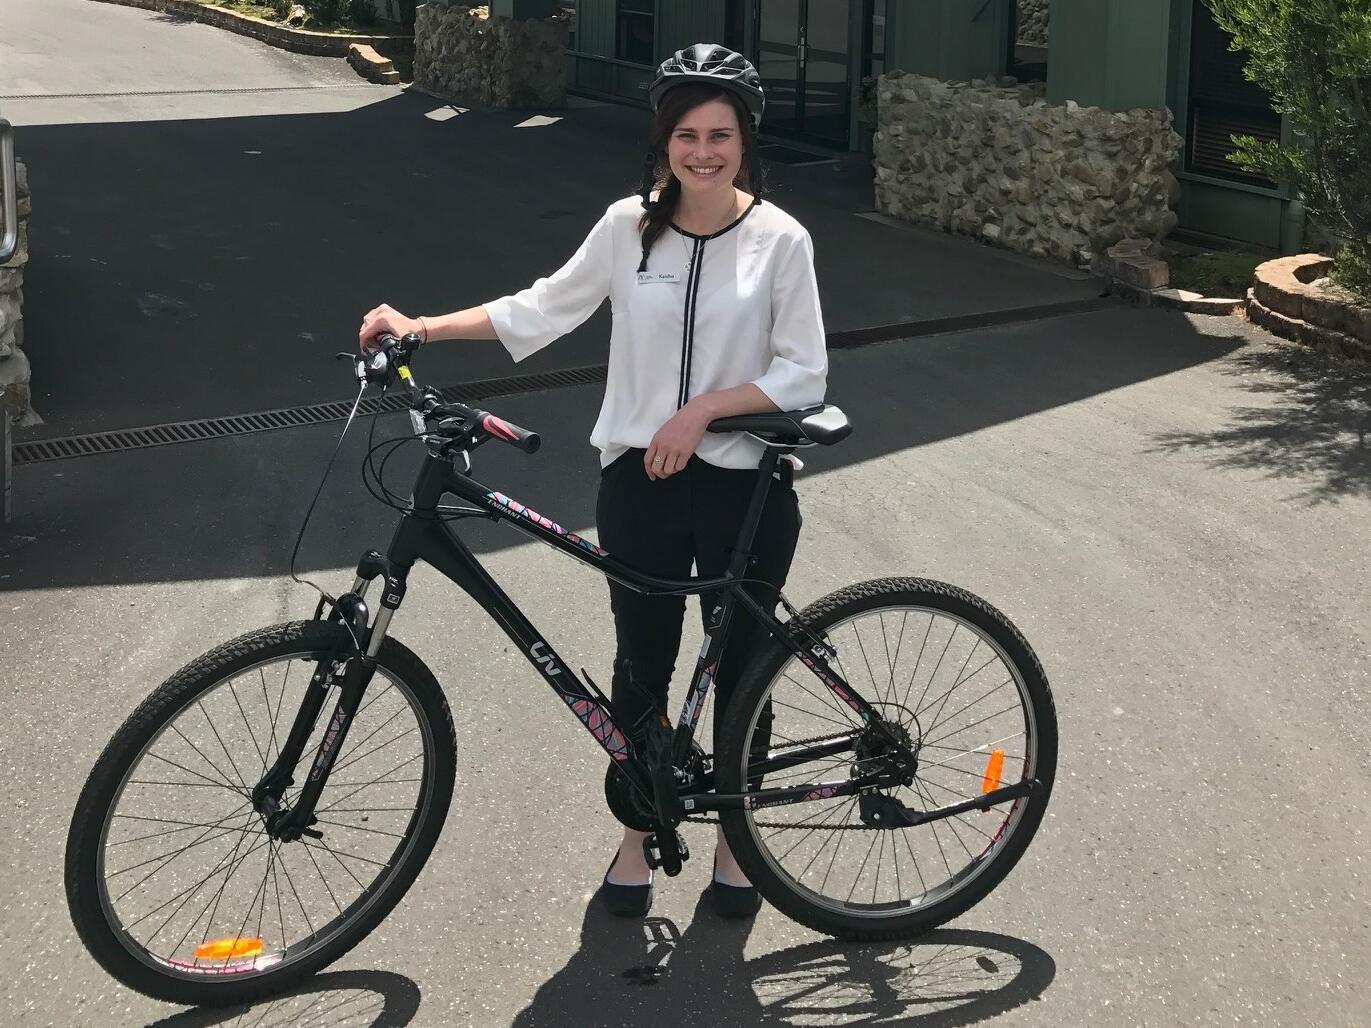 A lady holding a bike near Cradle Mountain Hotel